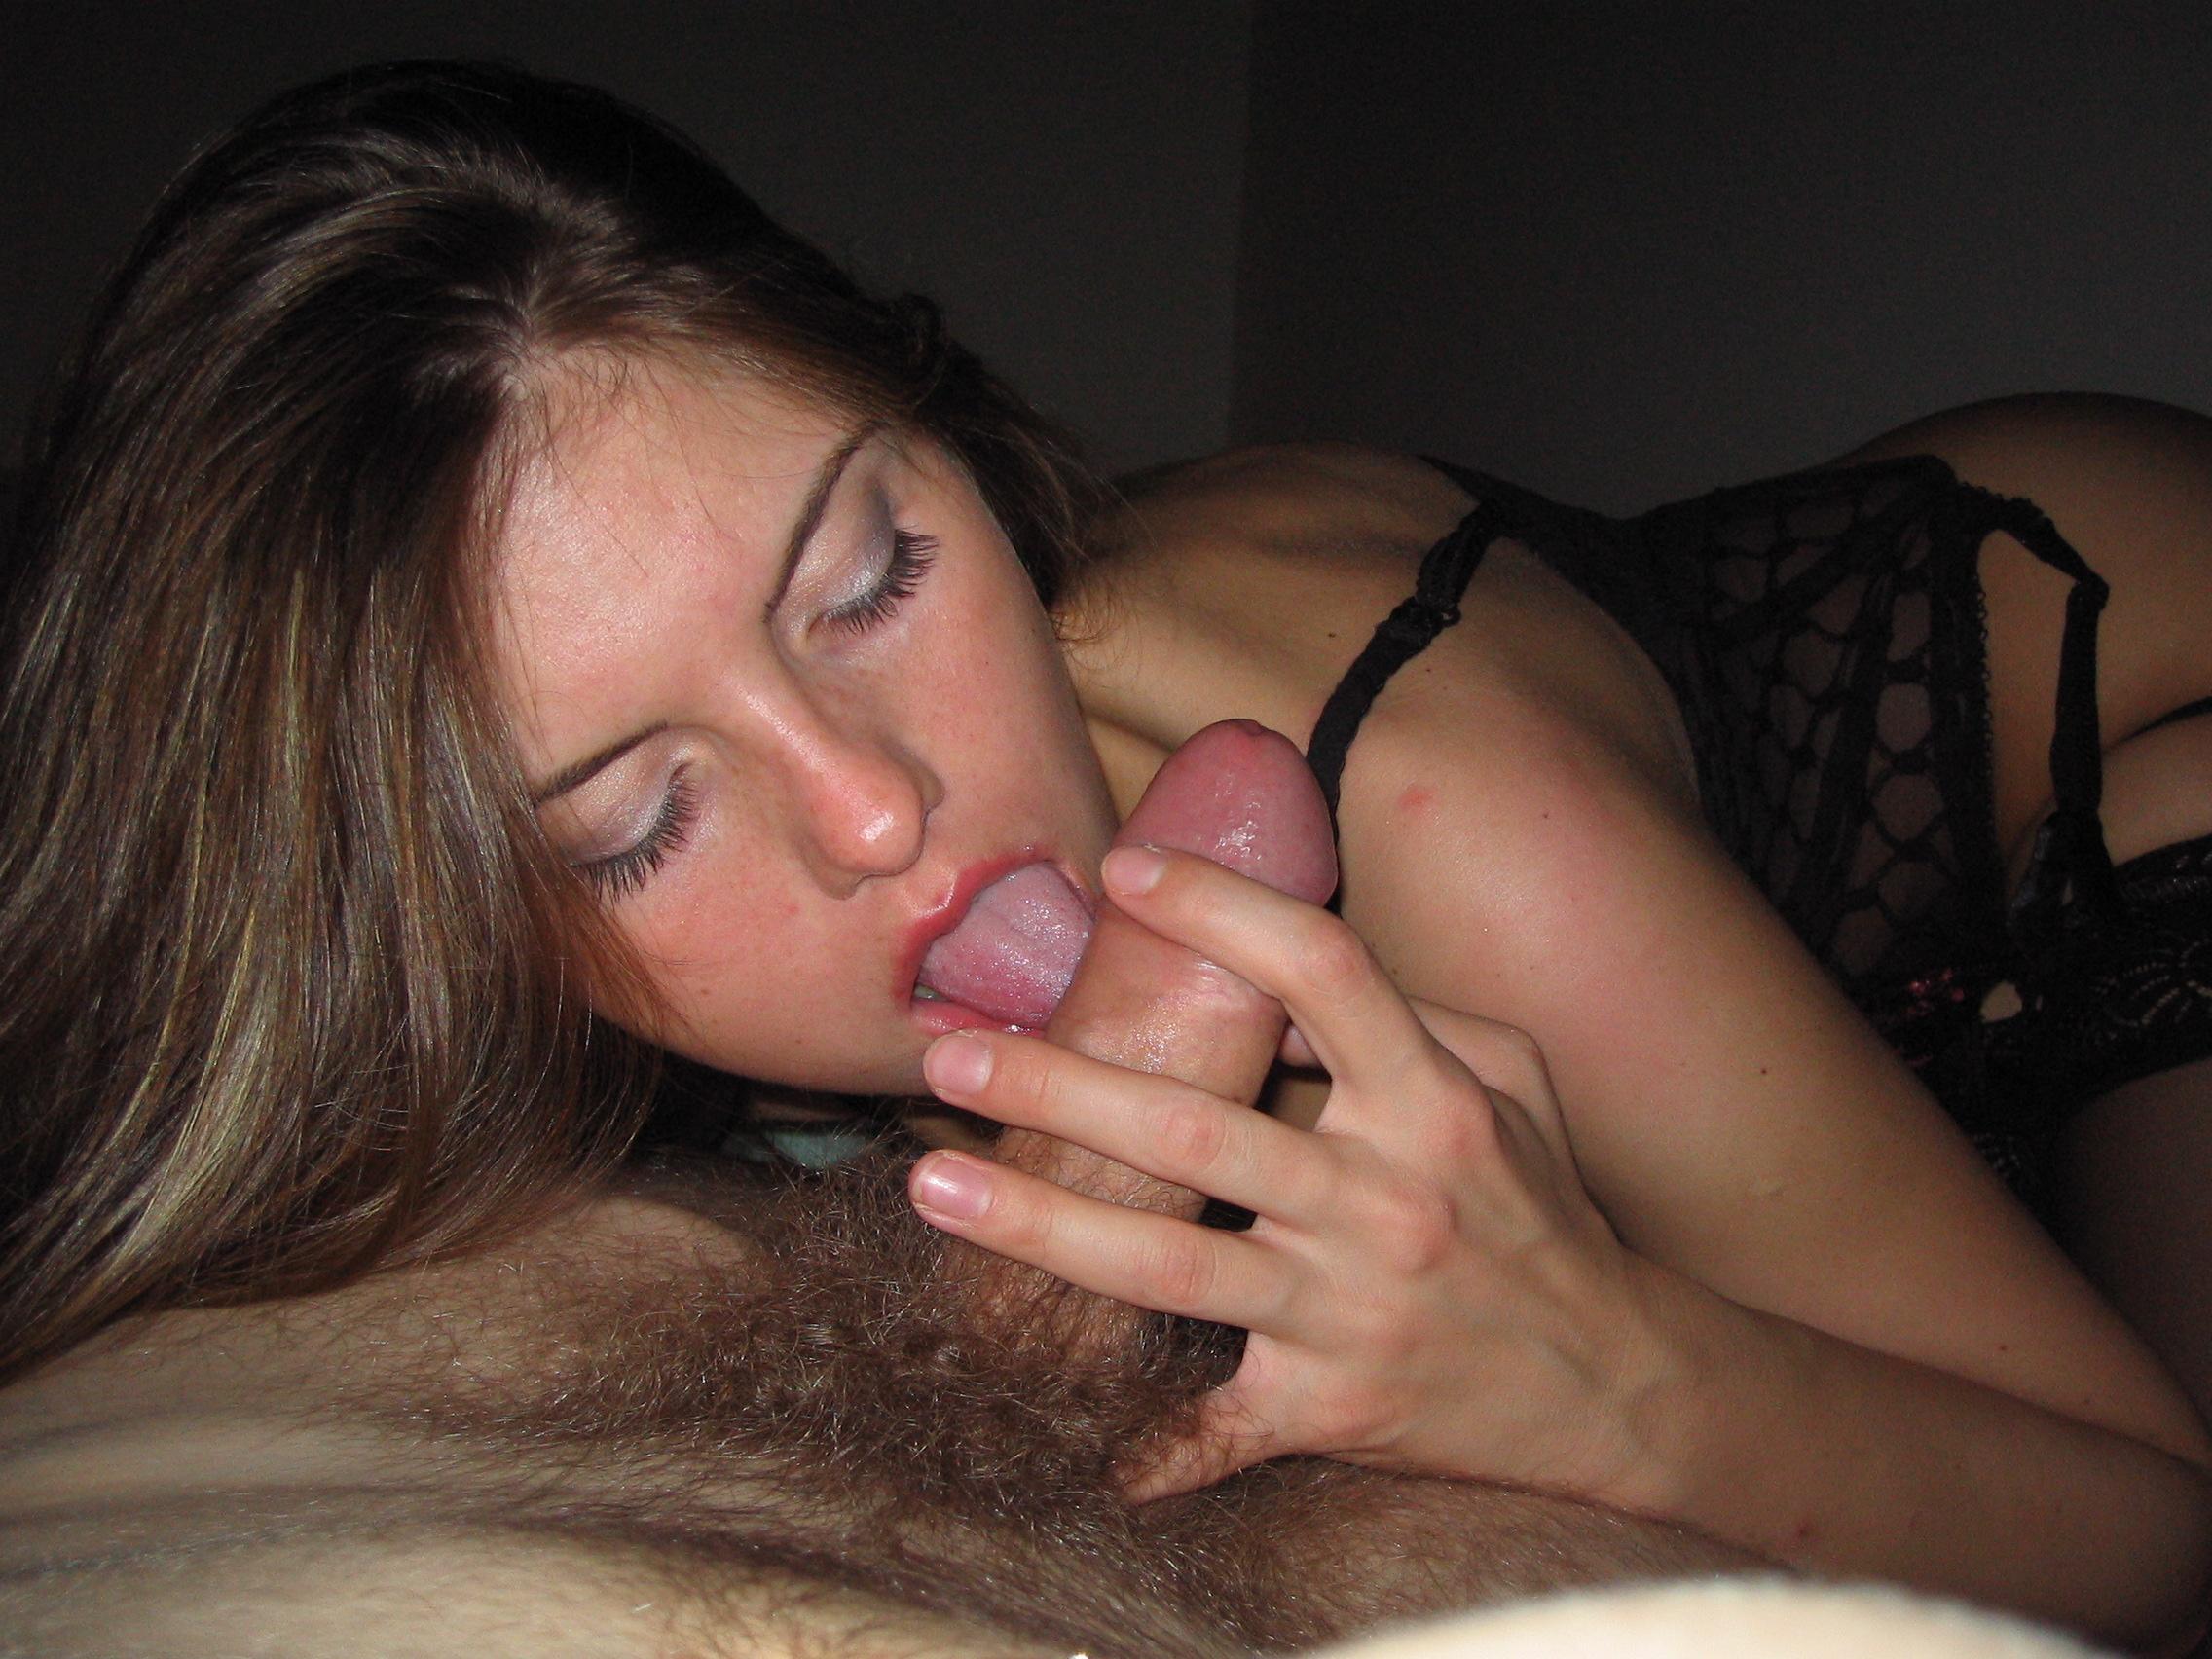 Сосут грудь девушки фото бесплатно 16 фотография